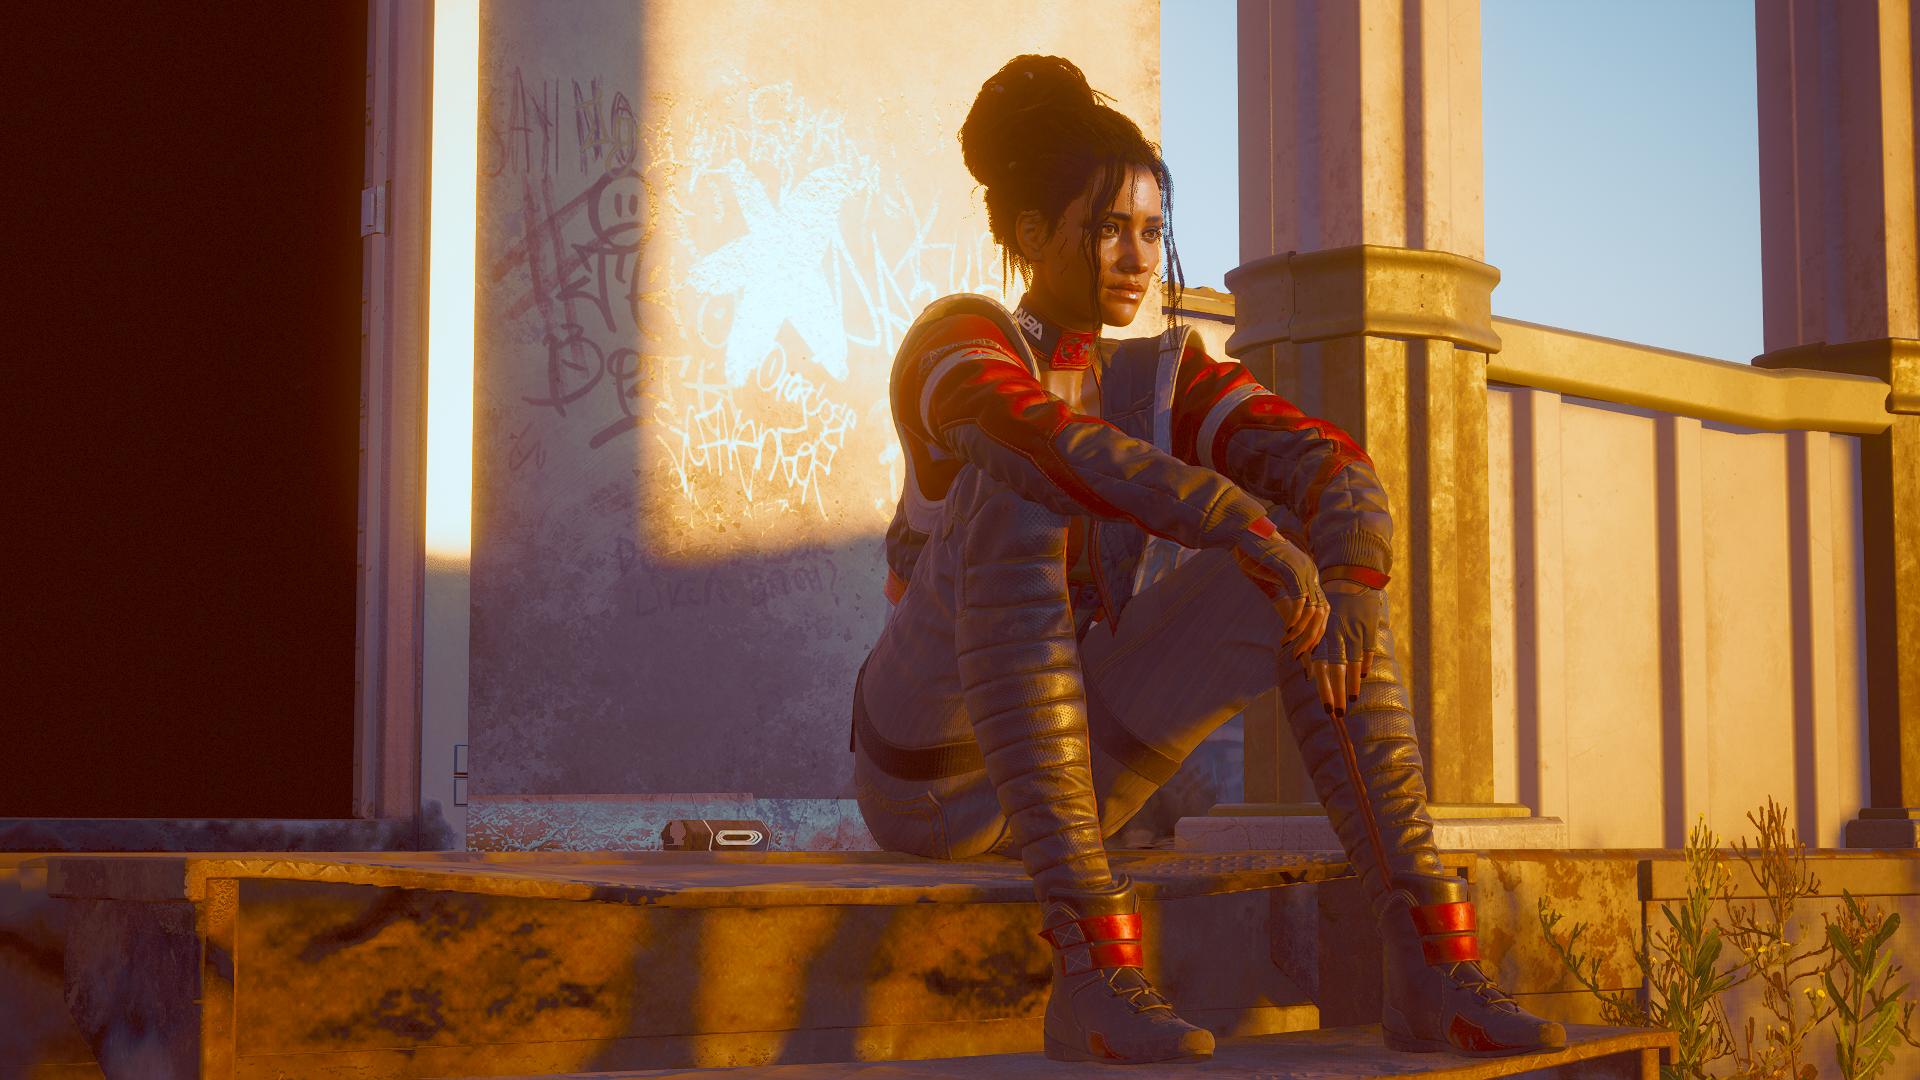 Panam Palmer Judy Alvarez Cyberpunk 2077 Cyberpunk Panam CD Projekt RED 1920x1080